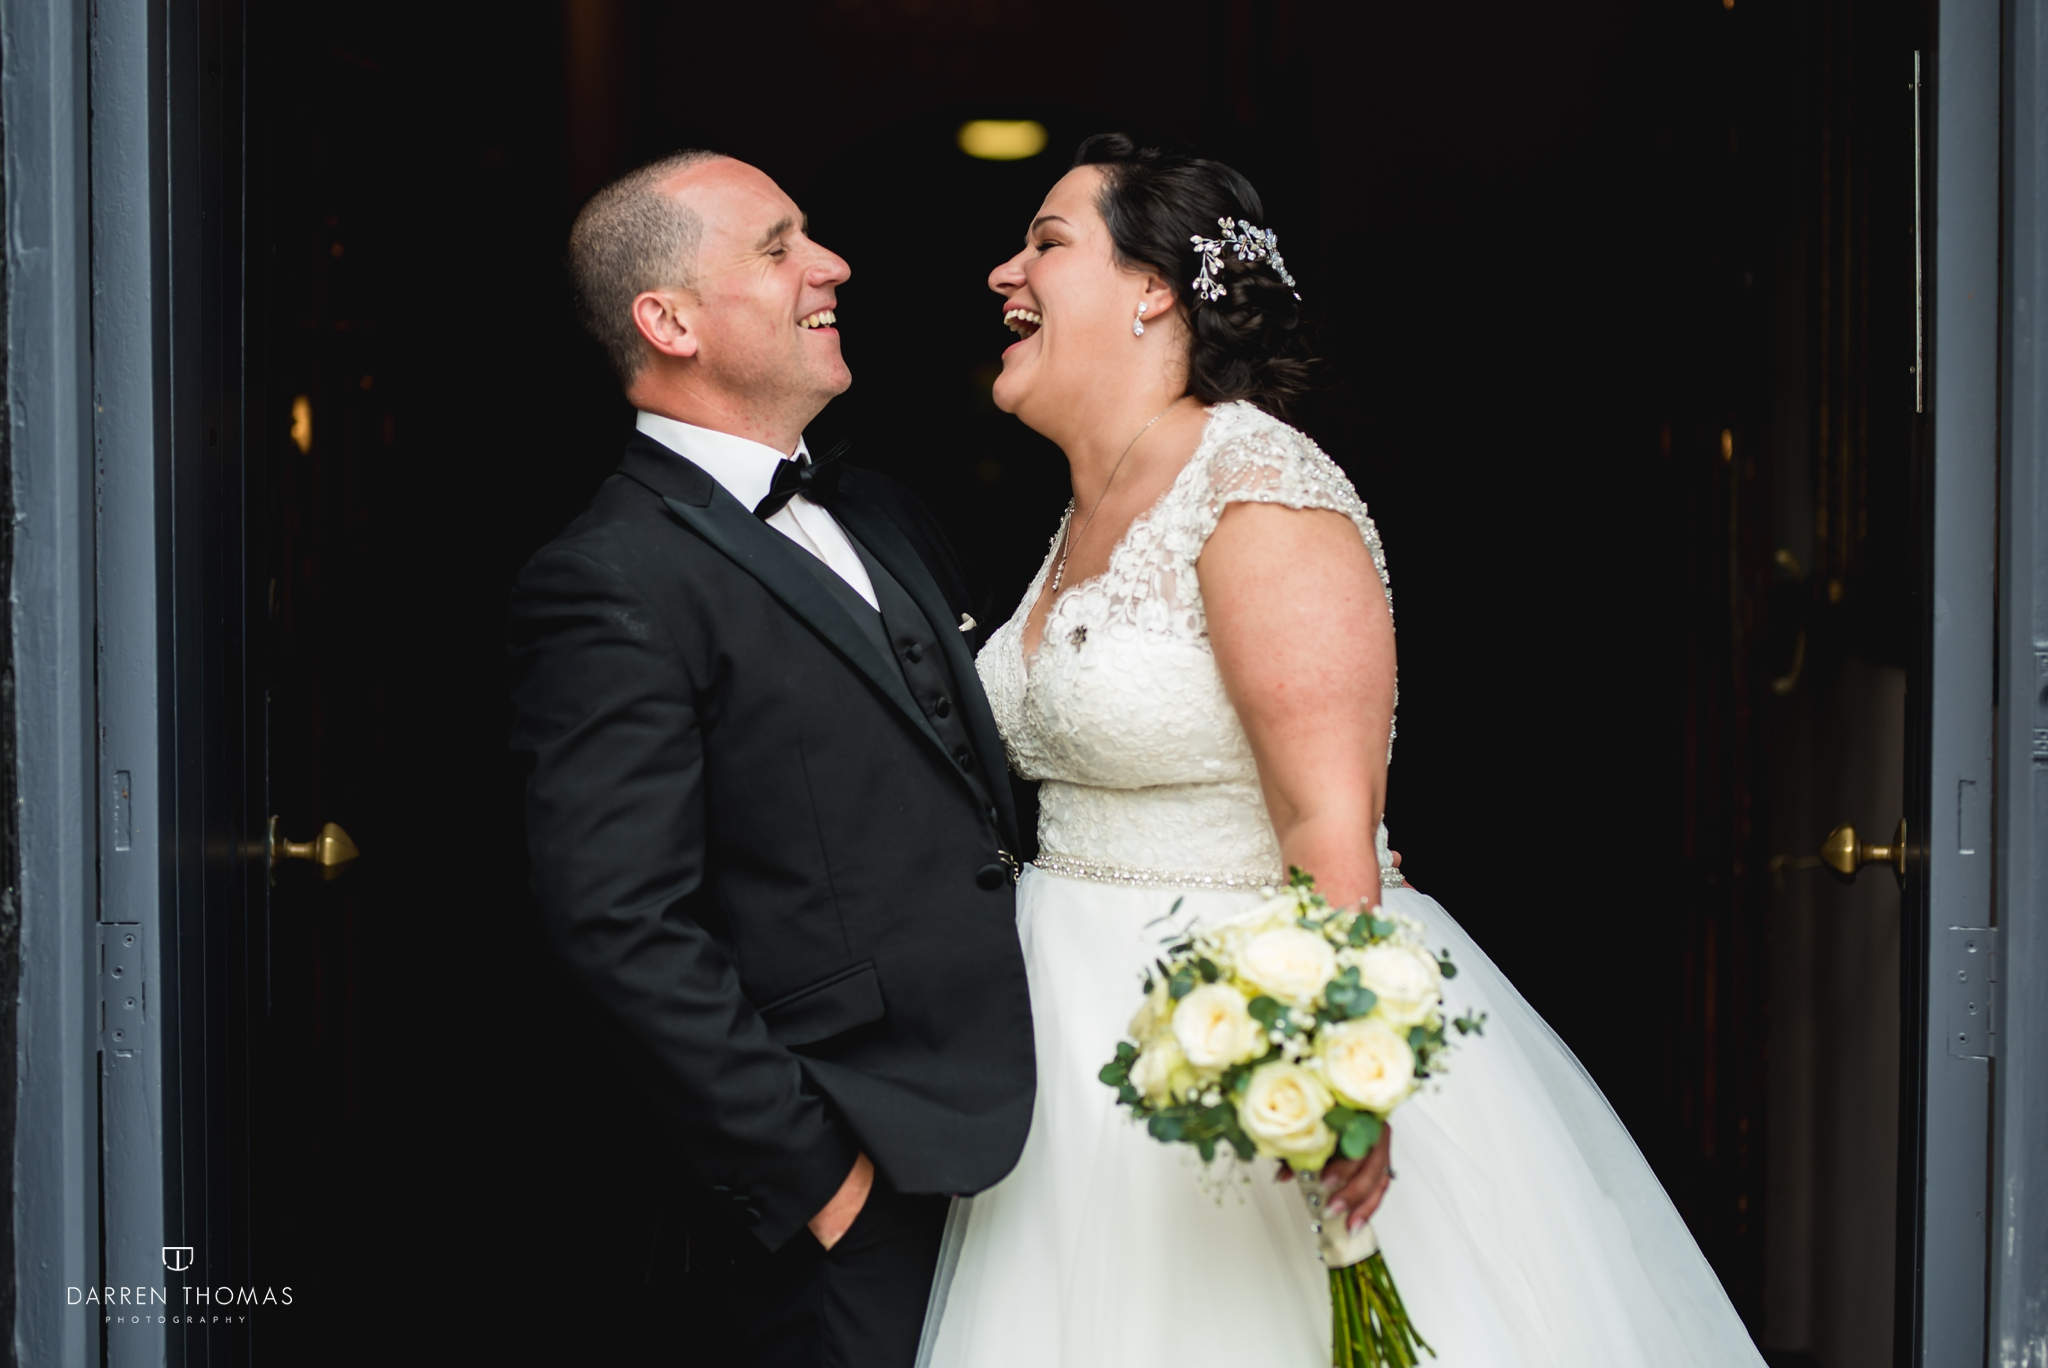 Llechwen-hall-wedding-photography16.jpg